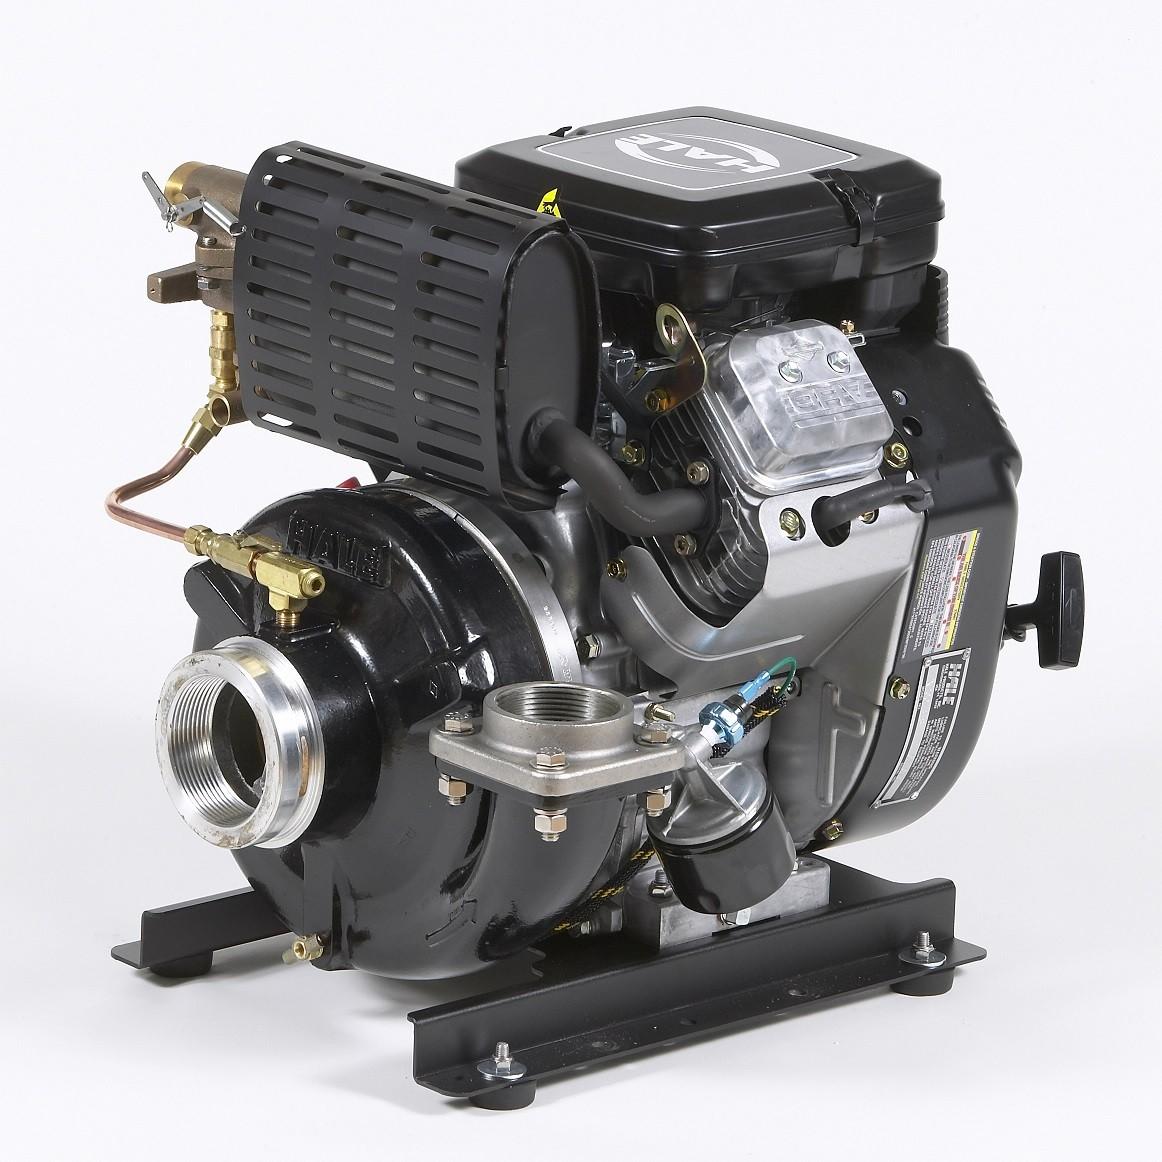 hight resolution of powerflow hpx200 b18